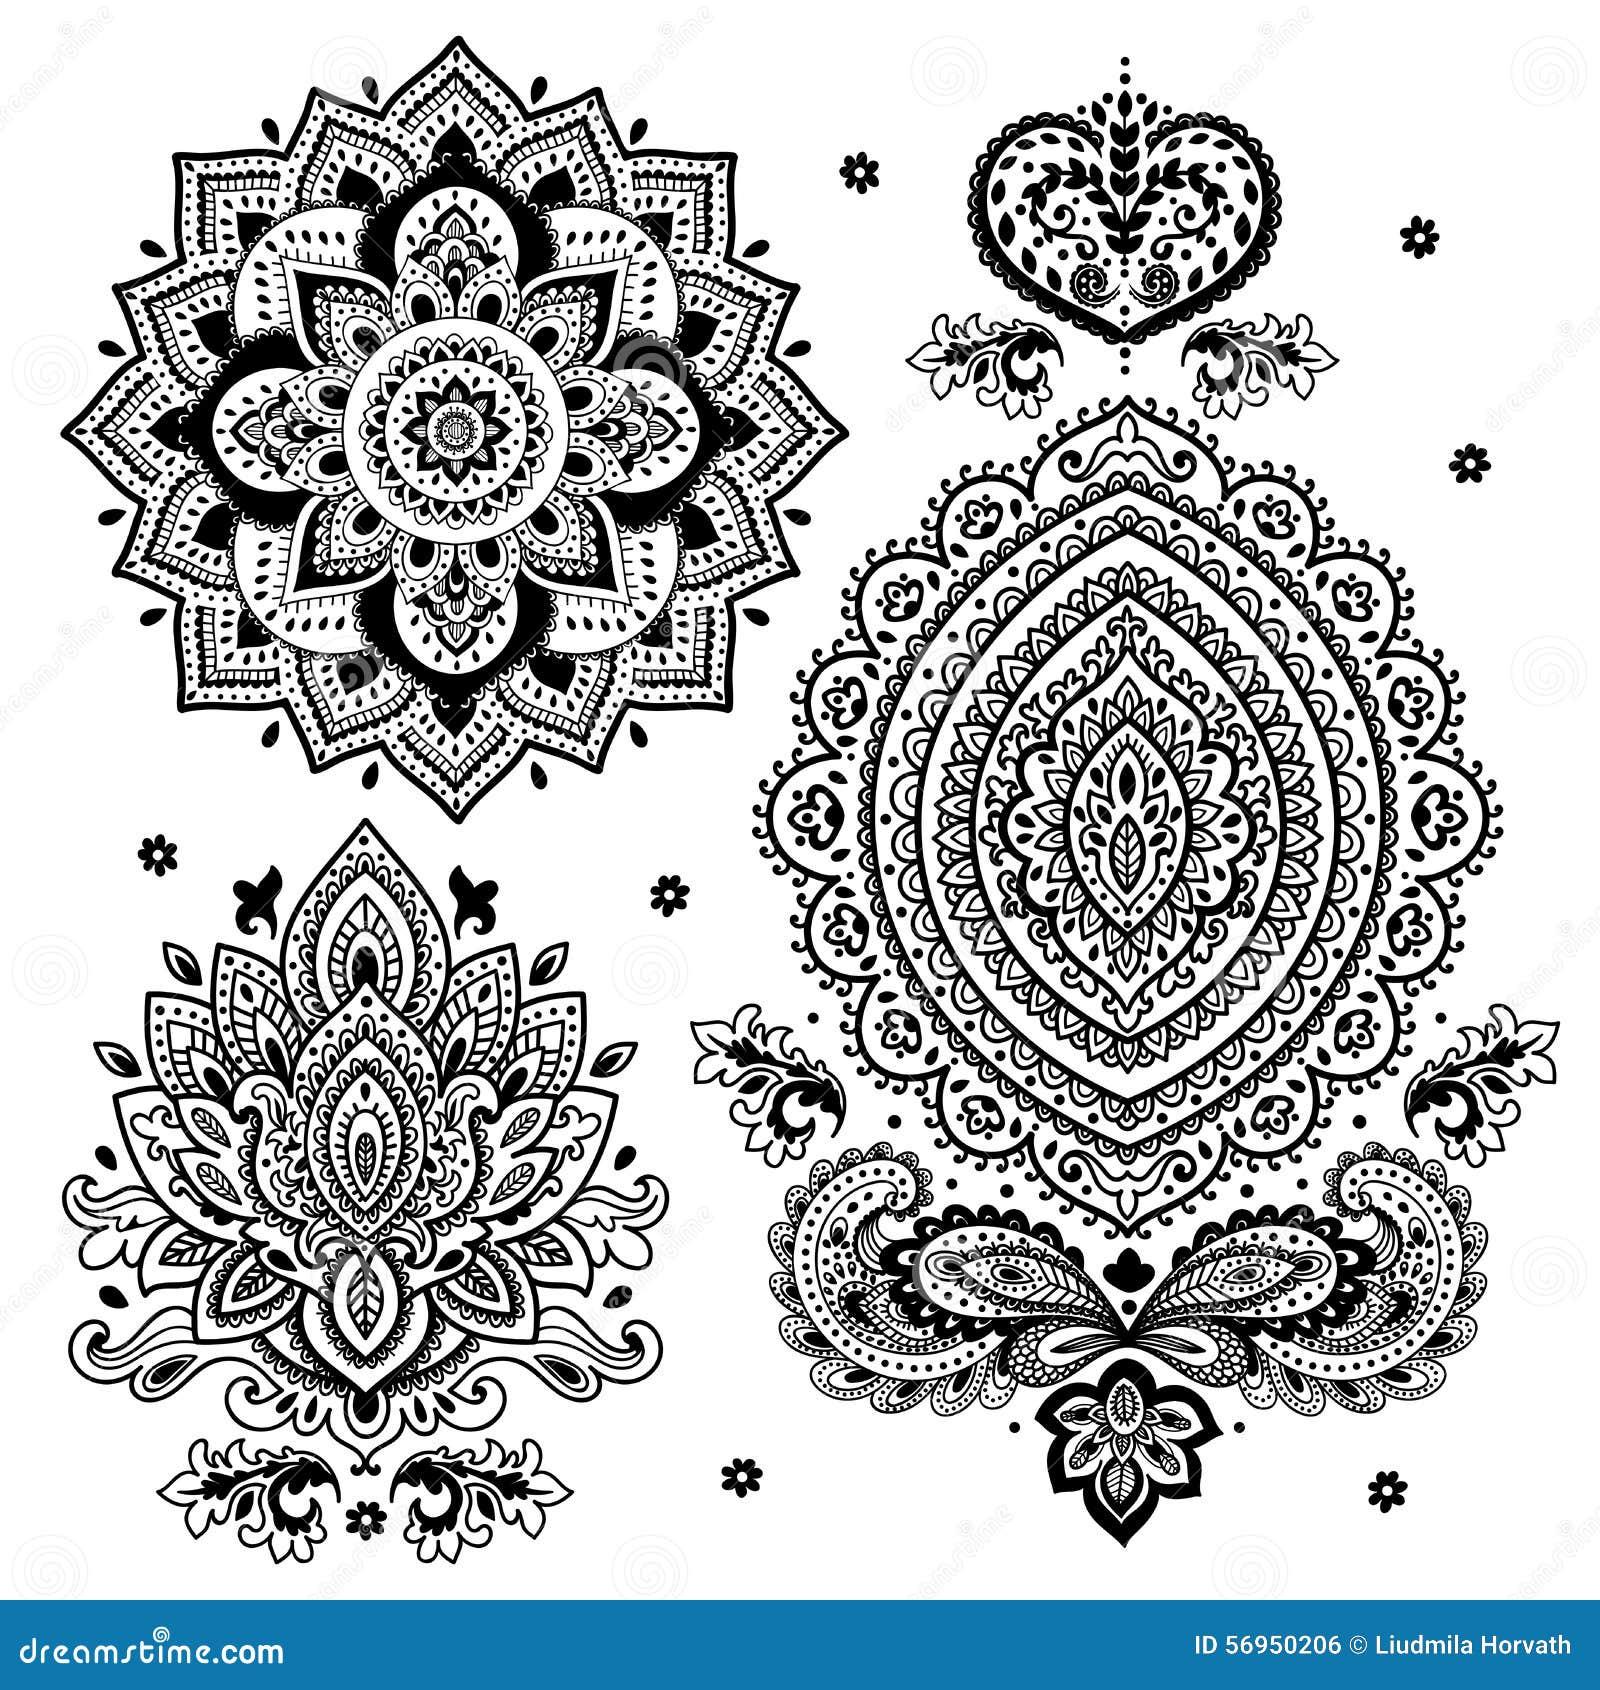 Sistema De Ornamentos Florales Indios Mandala Alhena Ilustracion Del - Mandalas-indios